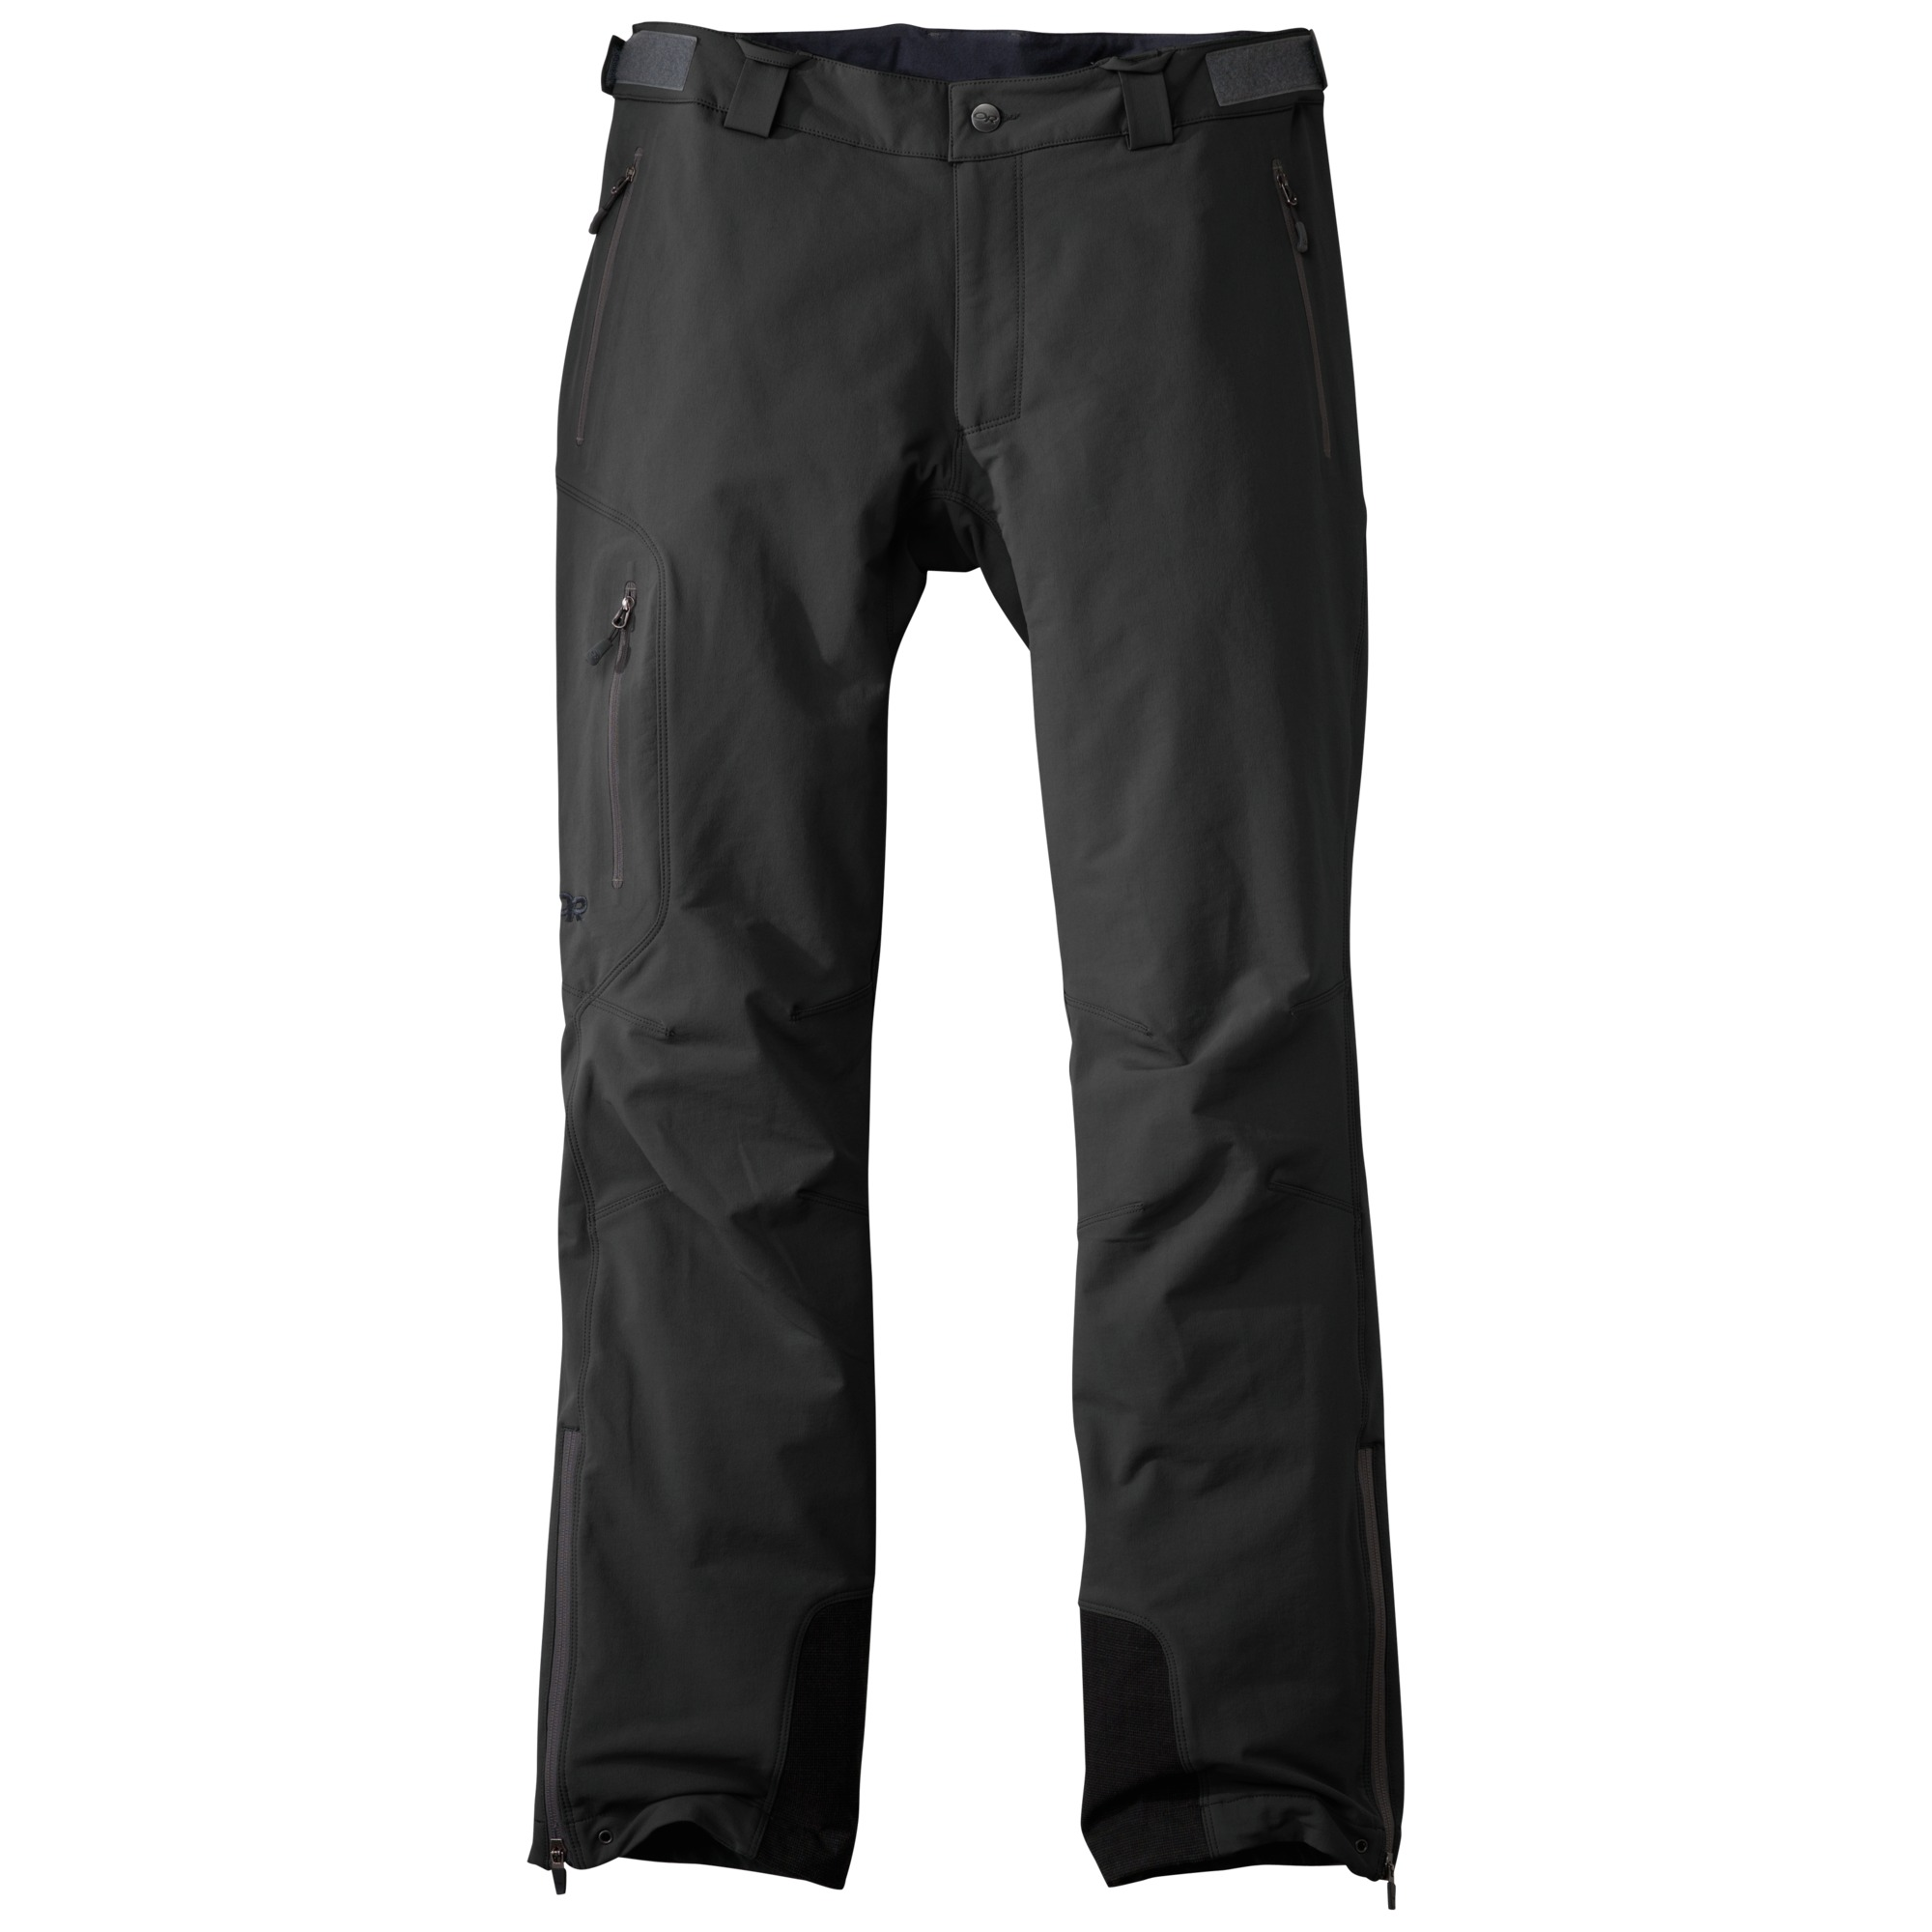 Outdoor Research Men's Cirque Pants-black-XL - Gr. XL